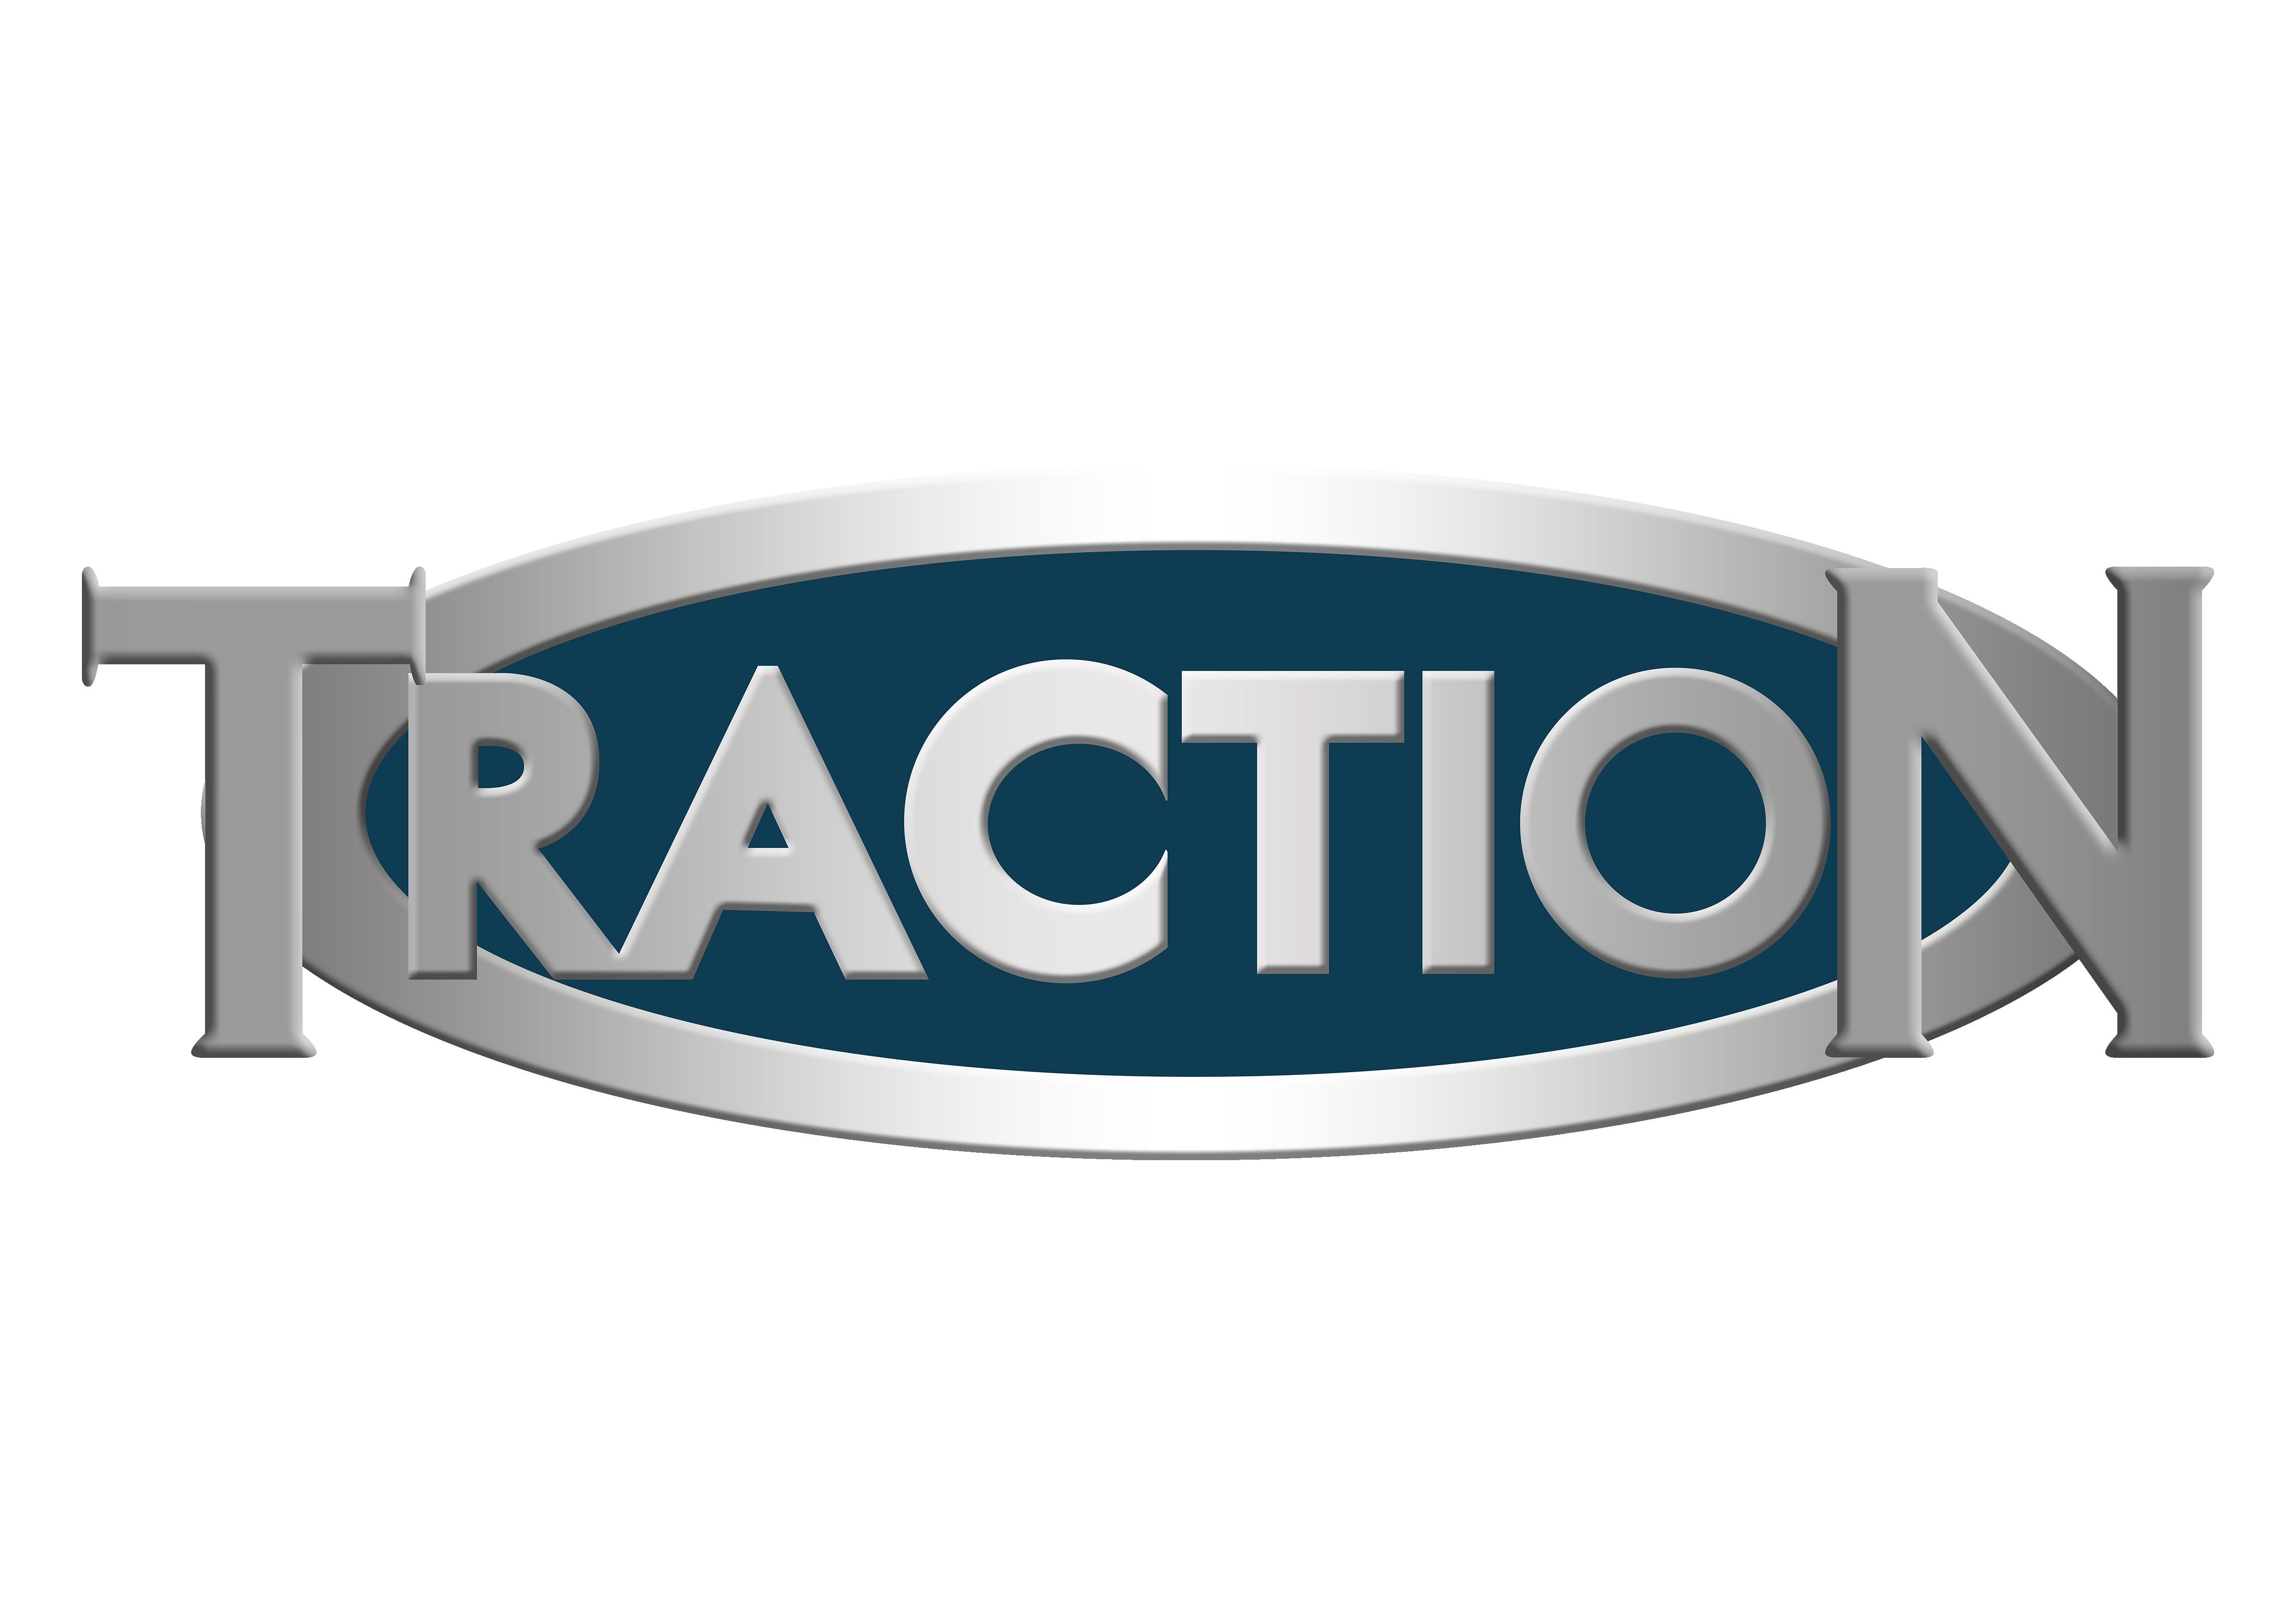 TRACTION - ΚΥΡΙΑΚΗ 2/2/20: Τι θα δούμε στην εκπομπή